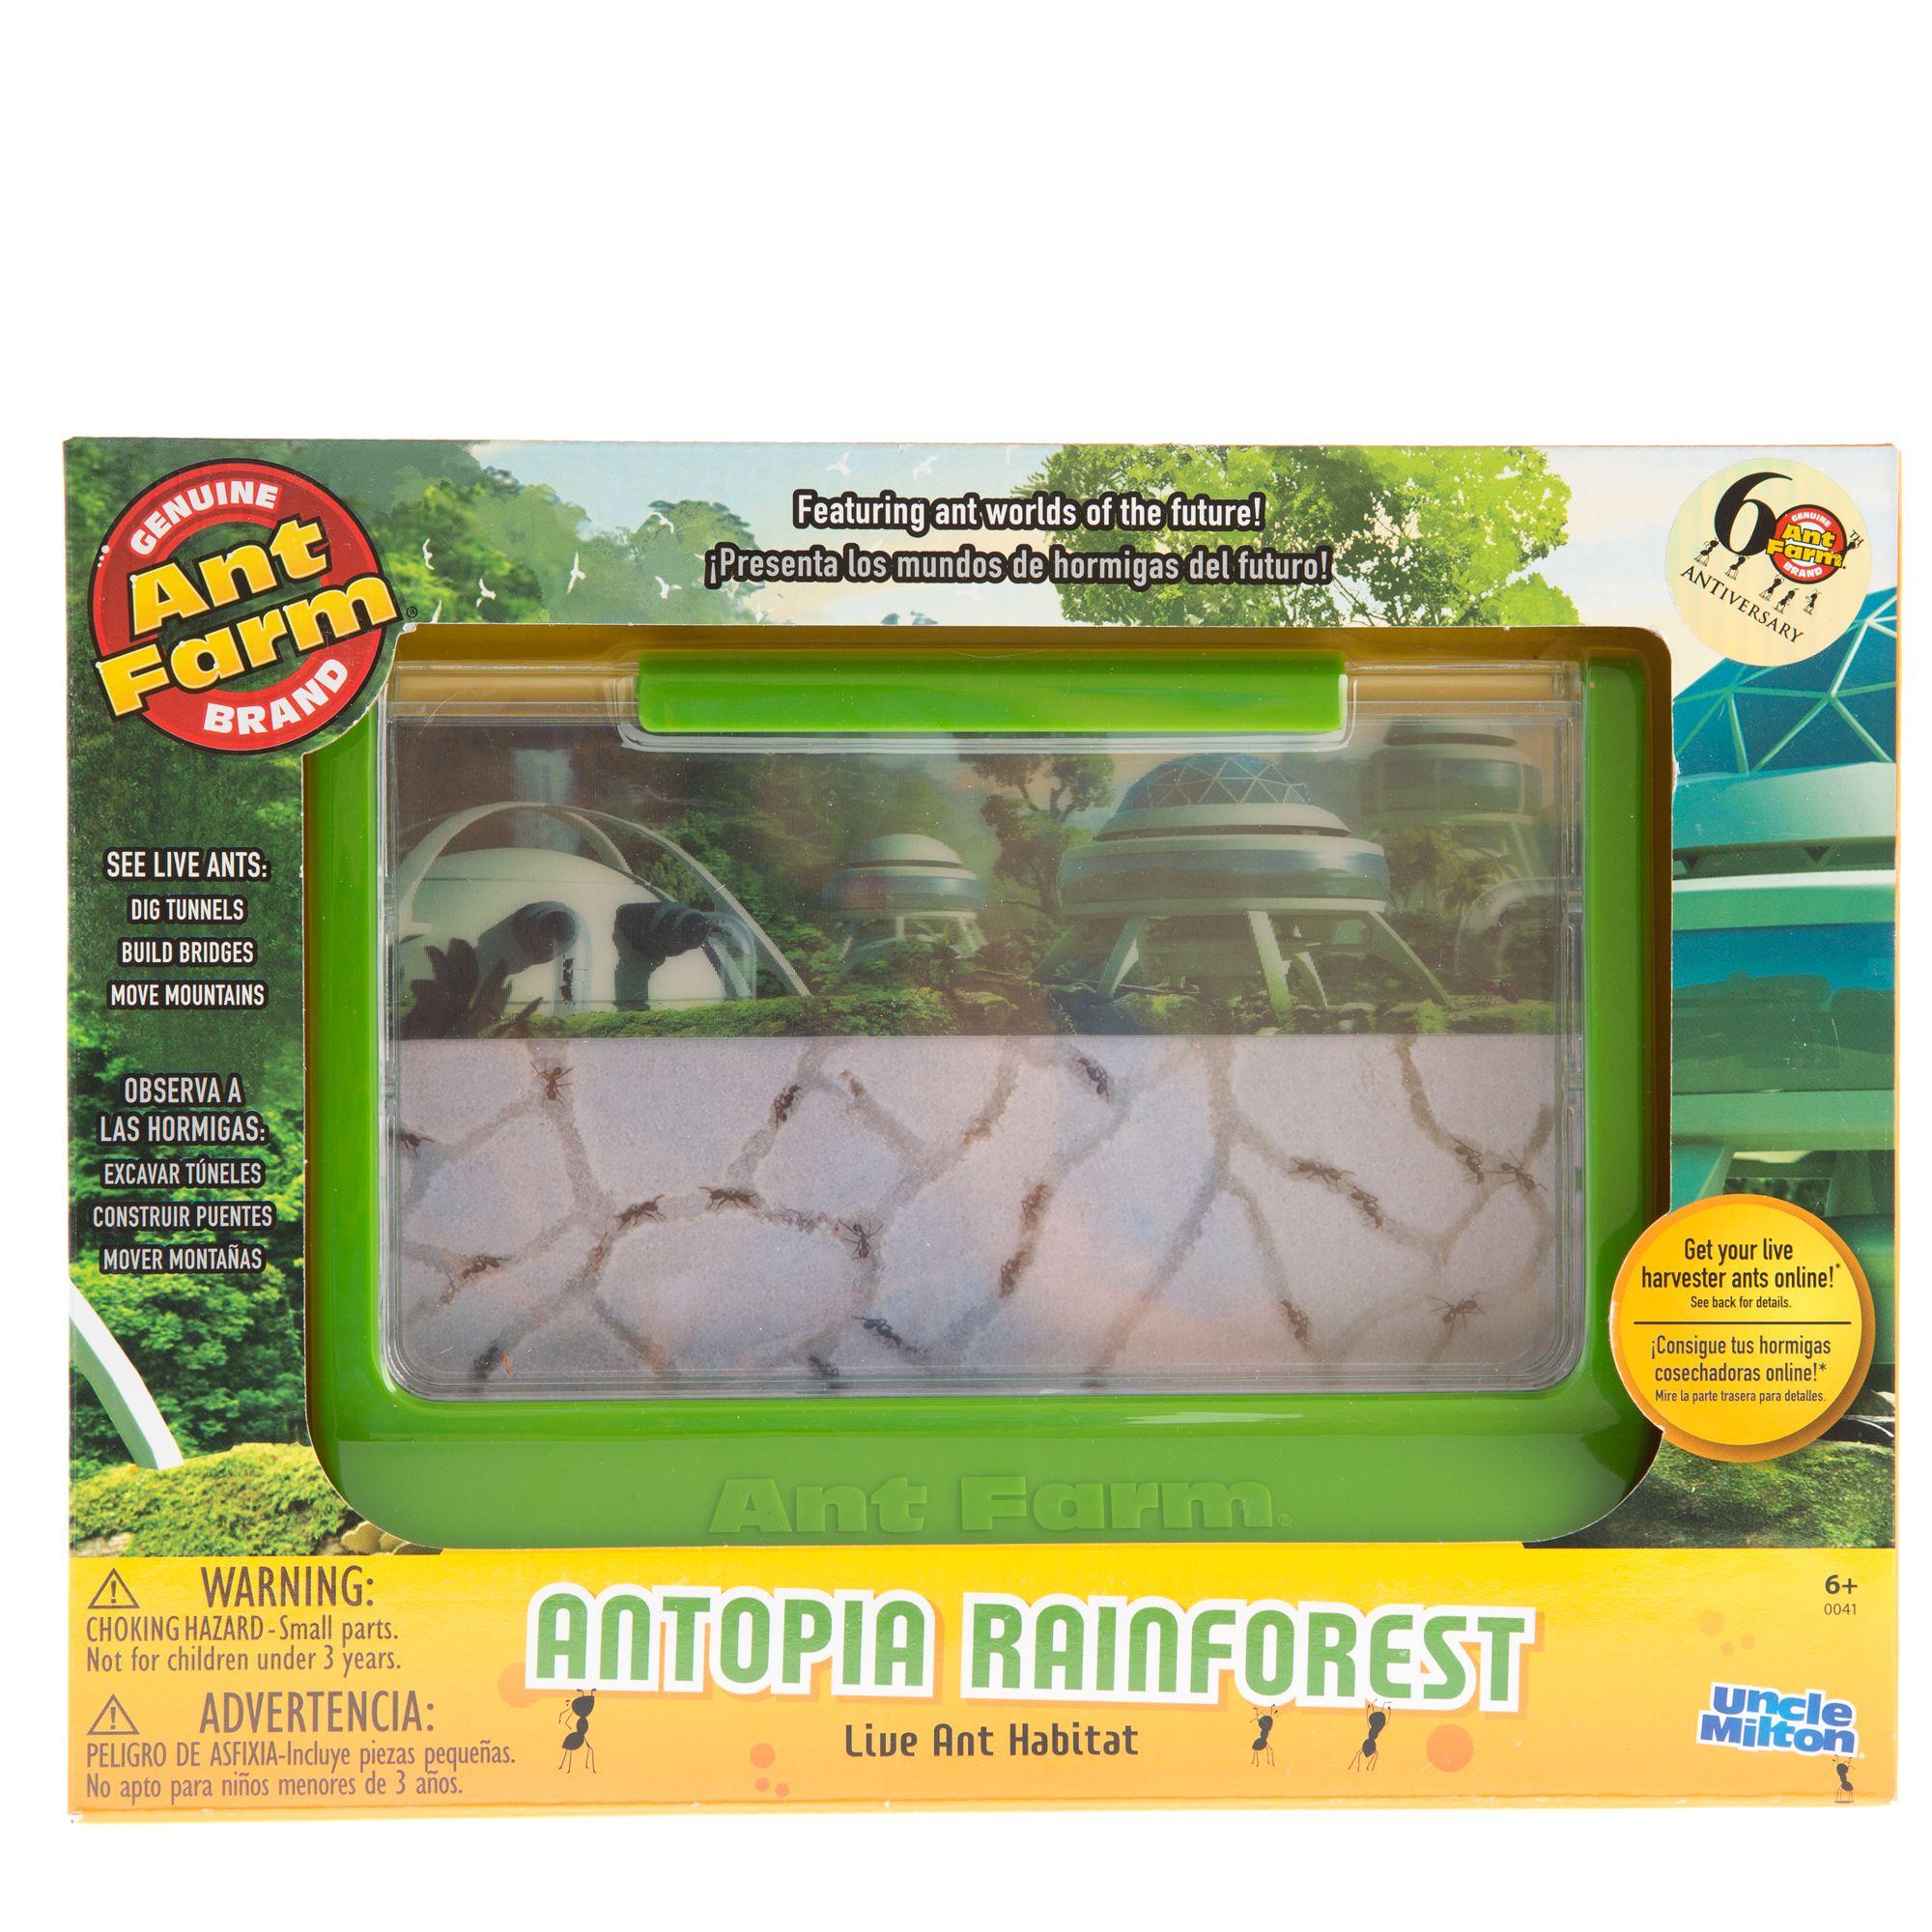 Uncle Miltons Antopia Rainforest Habitat Green